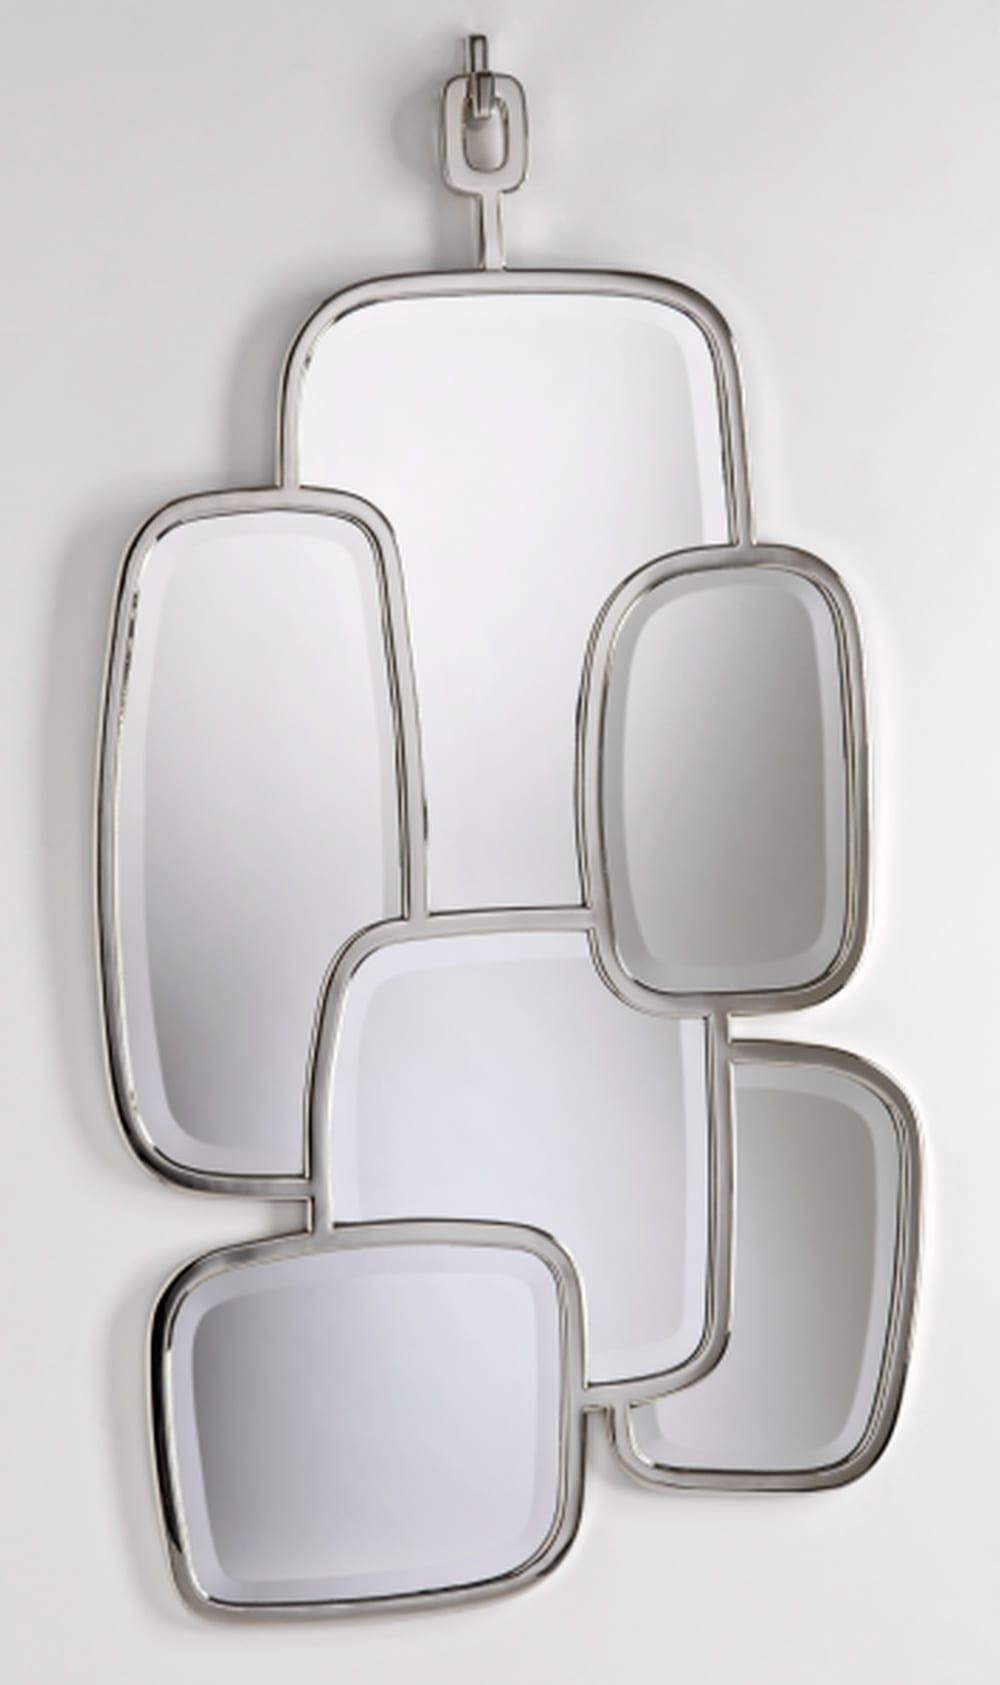 Hubert Le Gall, Deminino Mirror, 2006